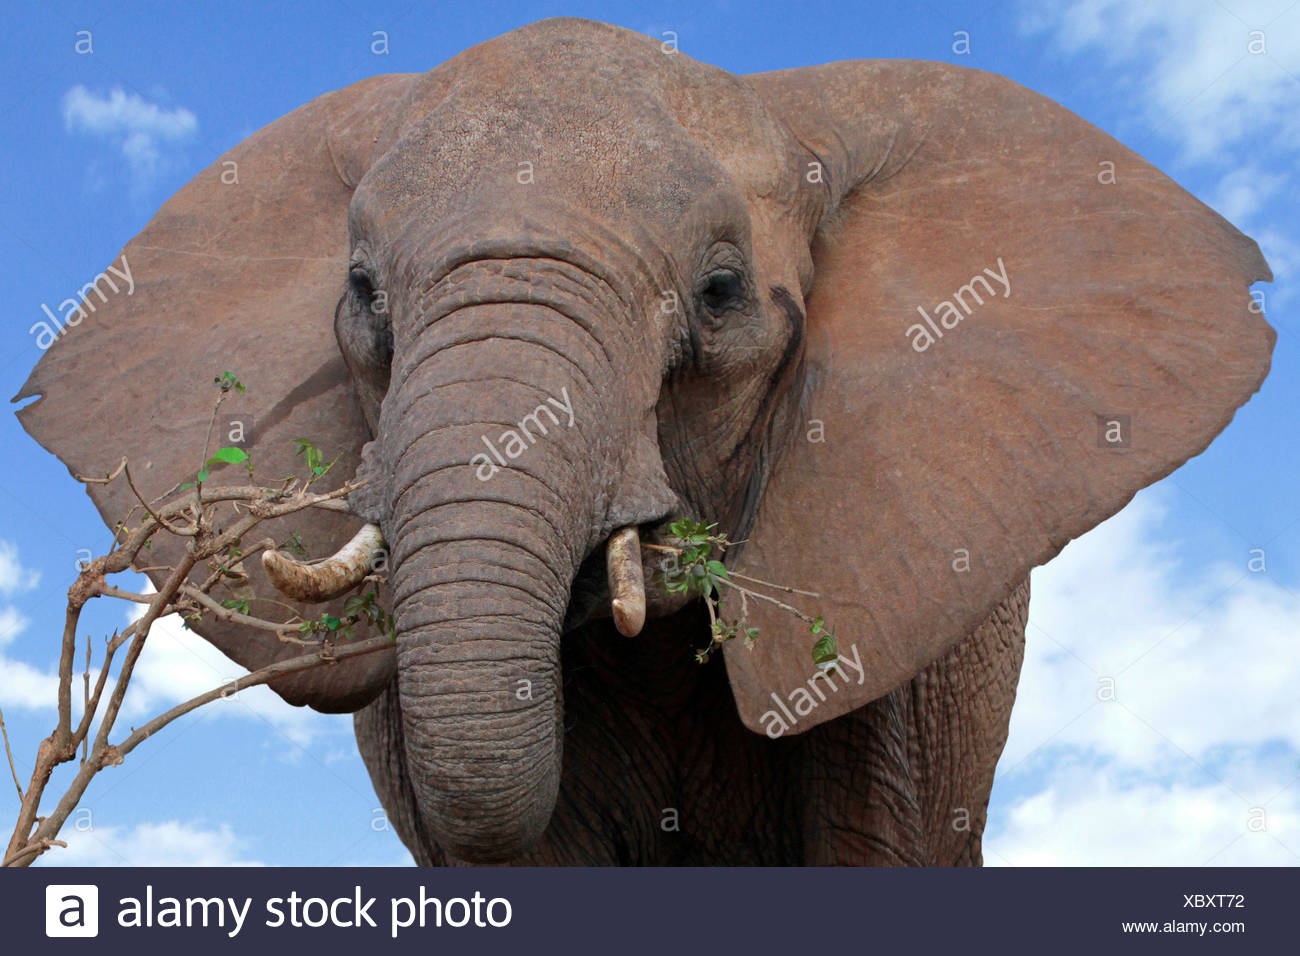 African elephant (Loxodonta africana), feeding a twig, Tanzania, Tarangire National Park - Stock Image